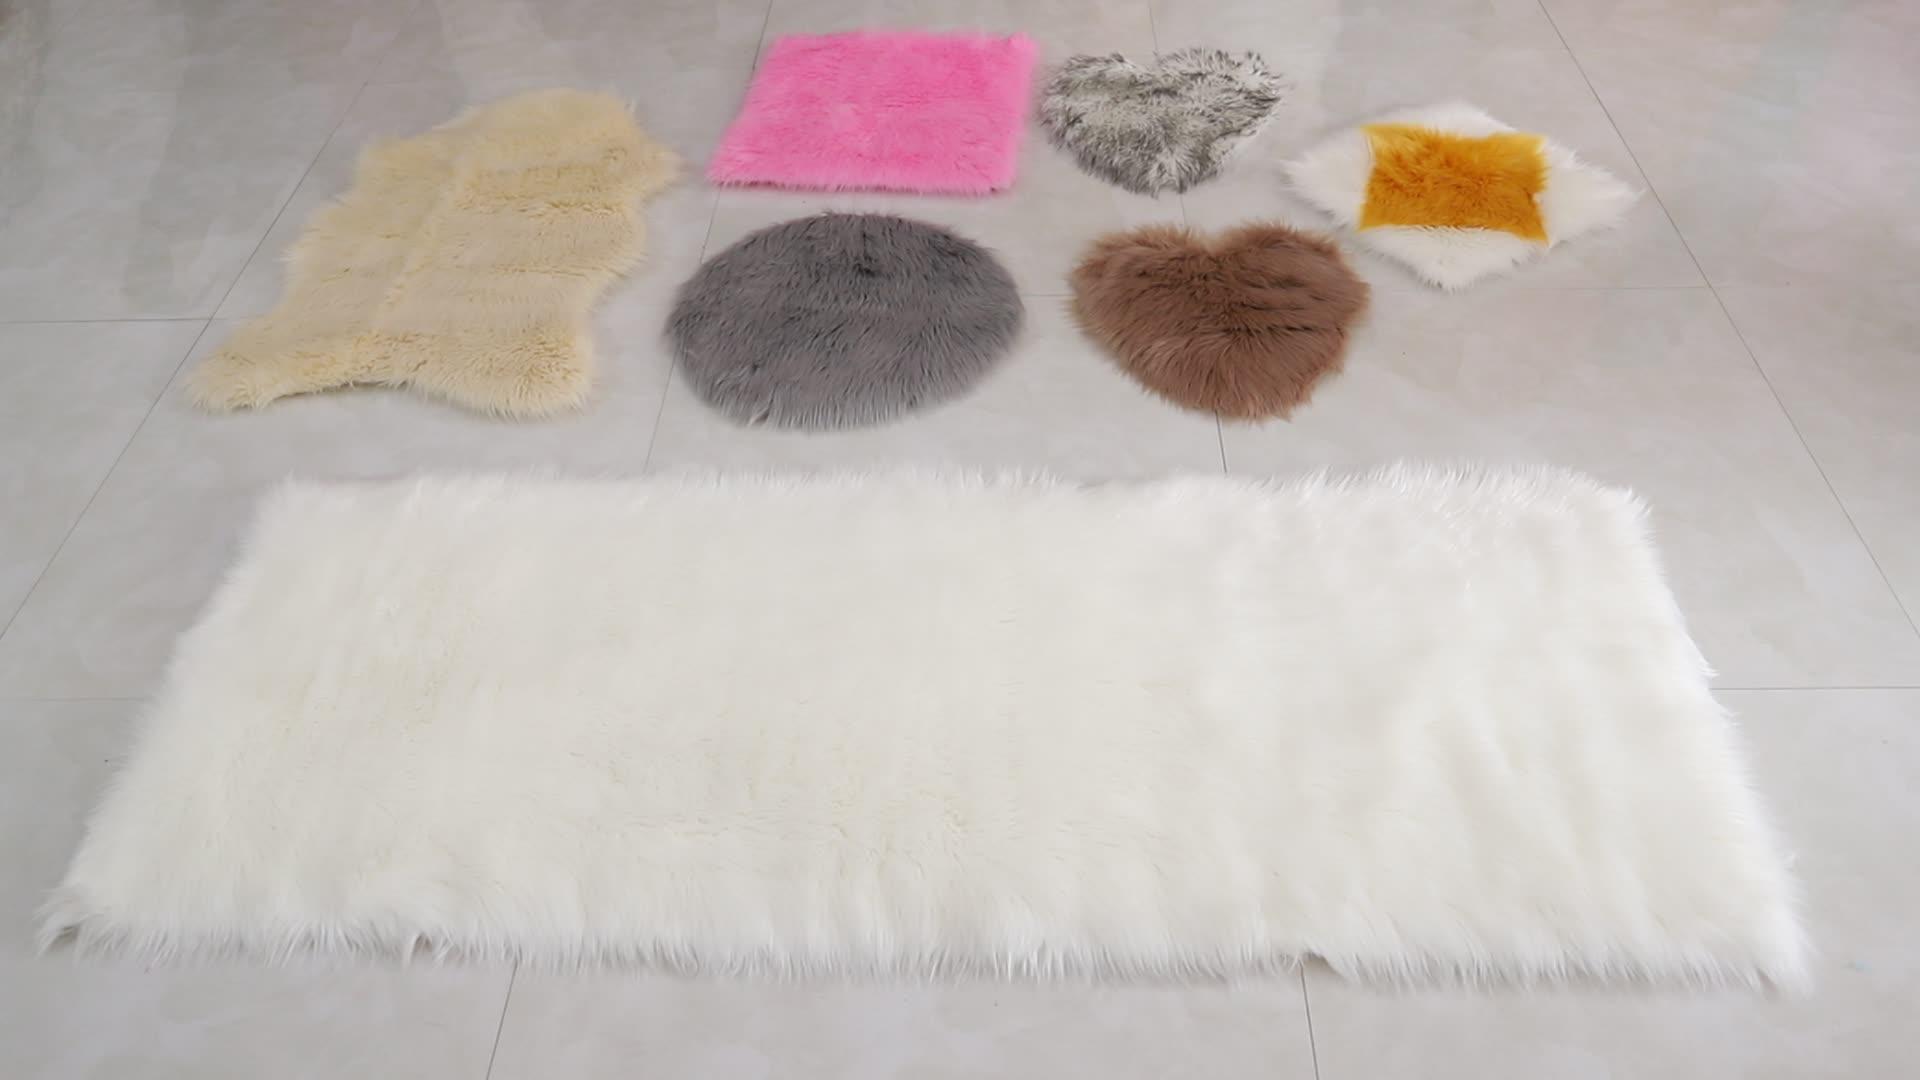 ¡Novedad de 2018! alfombras de piel de oveja blanca pura de felpa alfombra de piel falsa